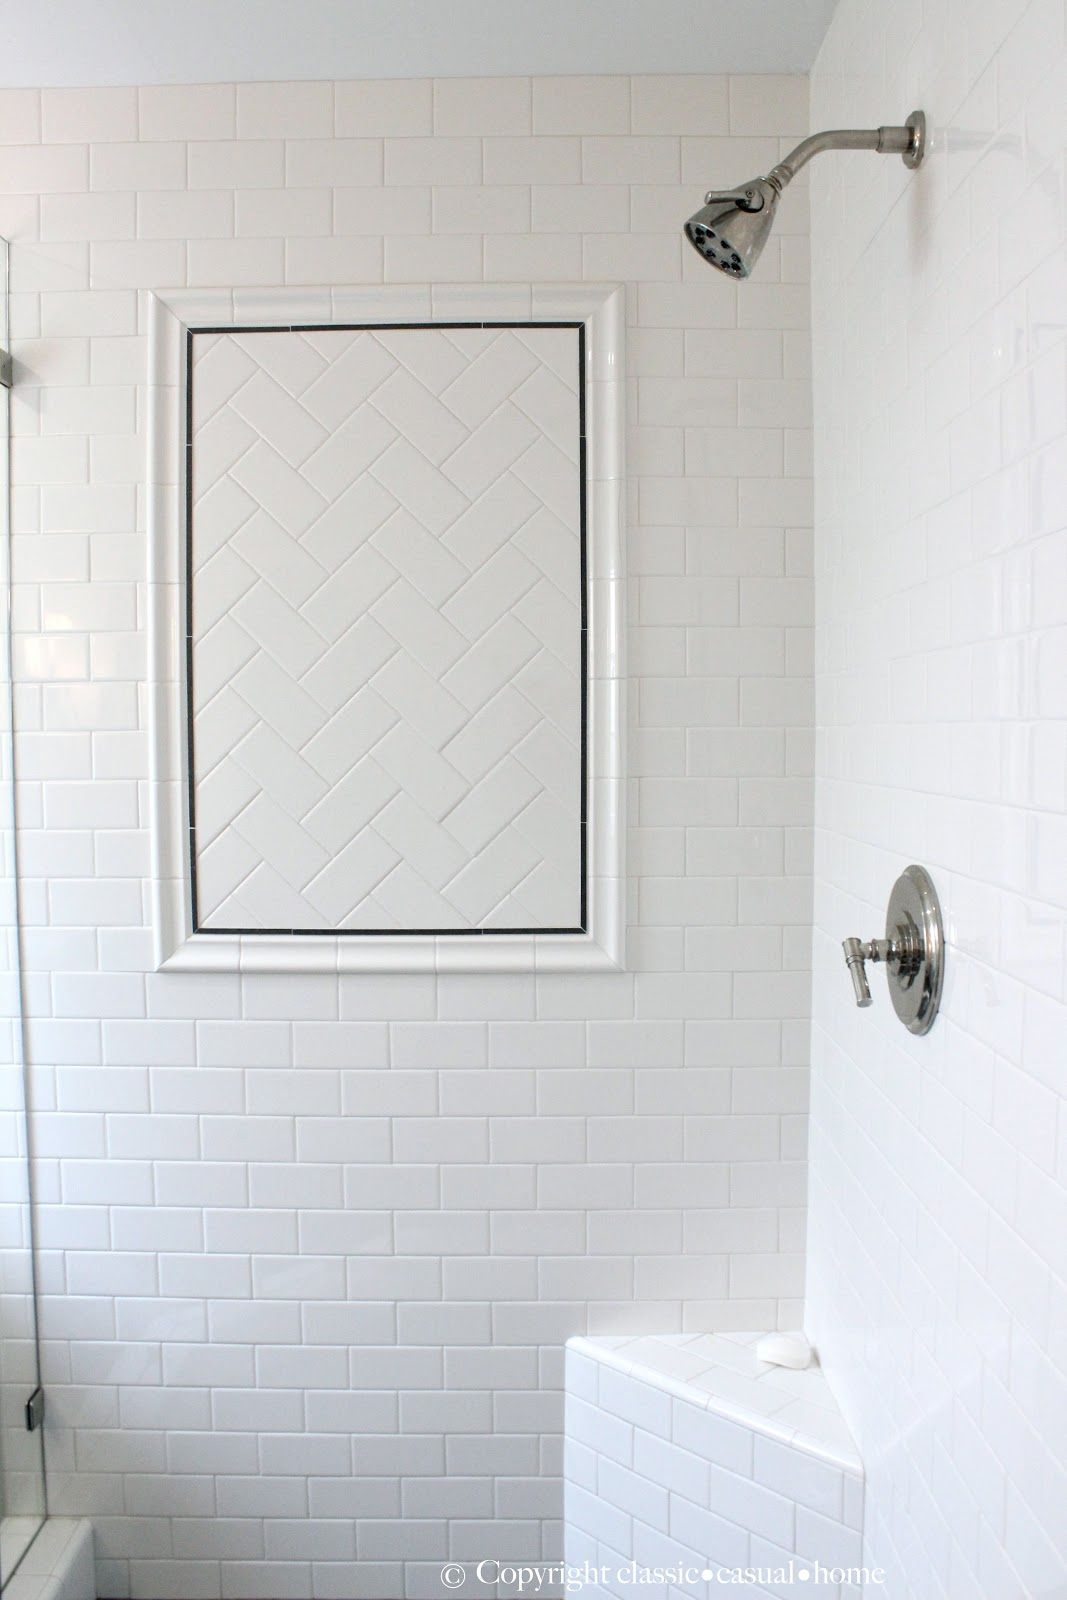 Herringbone Tile Inlay Subway Tile Showers Subway Tile